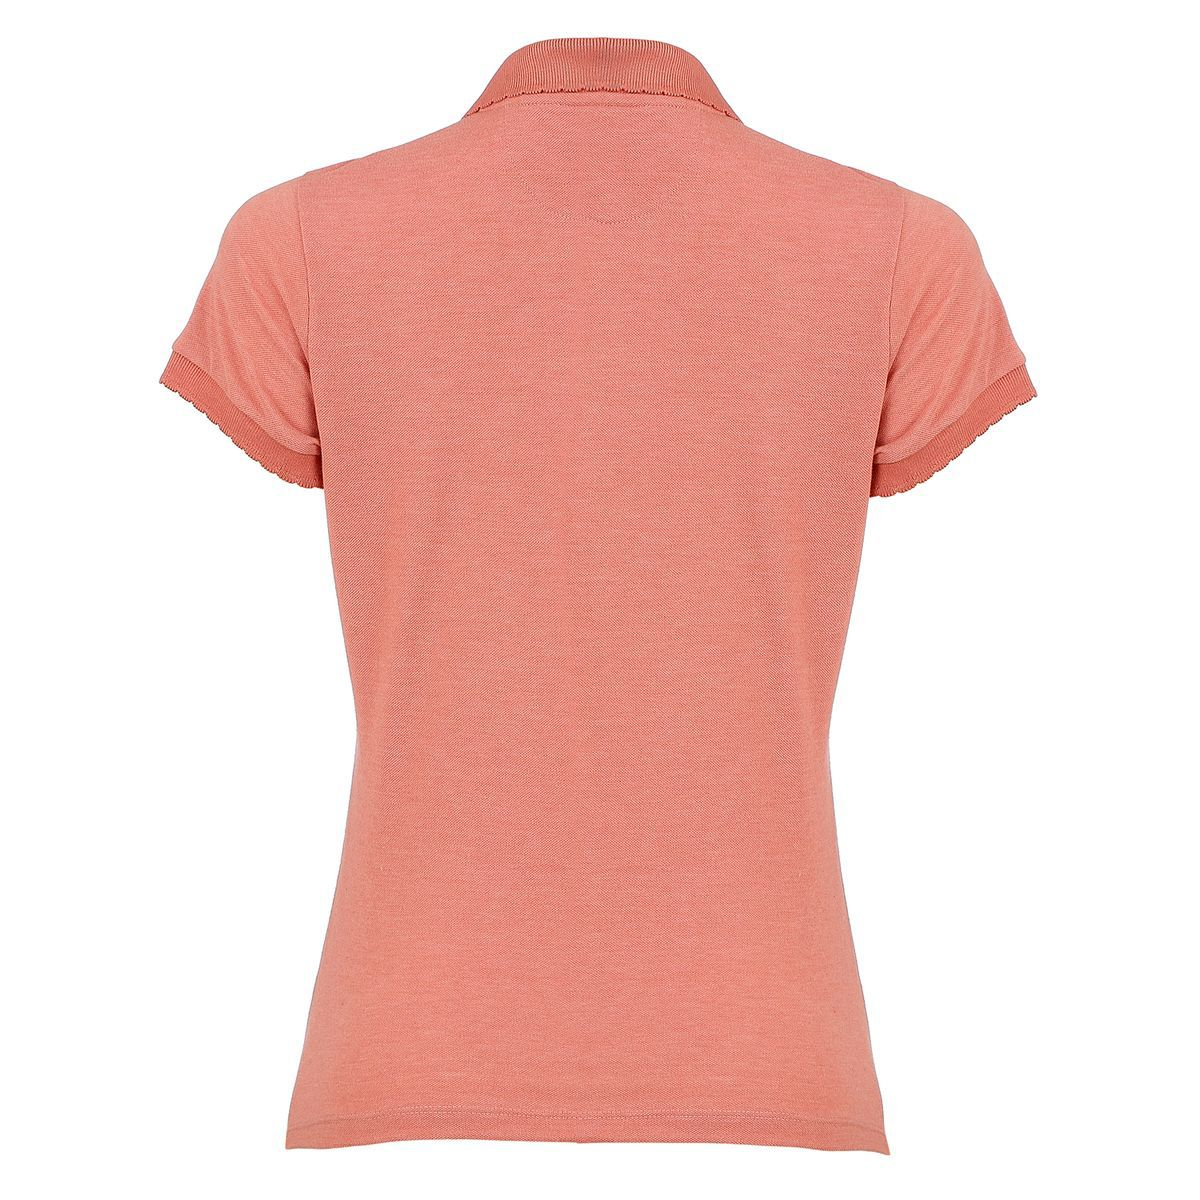 Camisa Polo Seeder Feminina com Renda Terracota